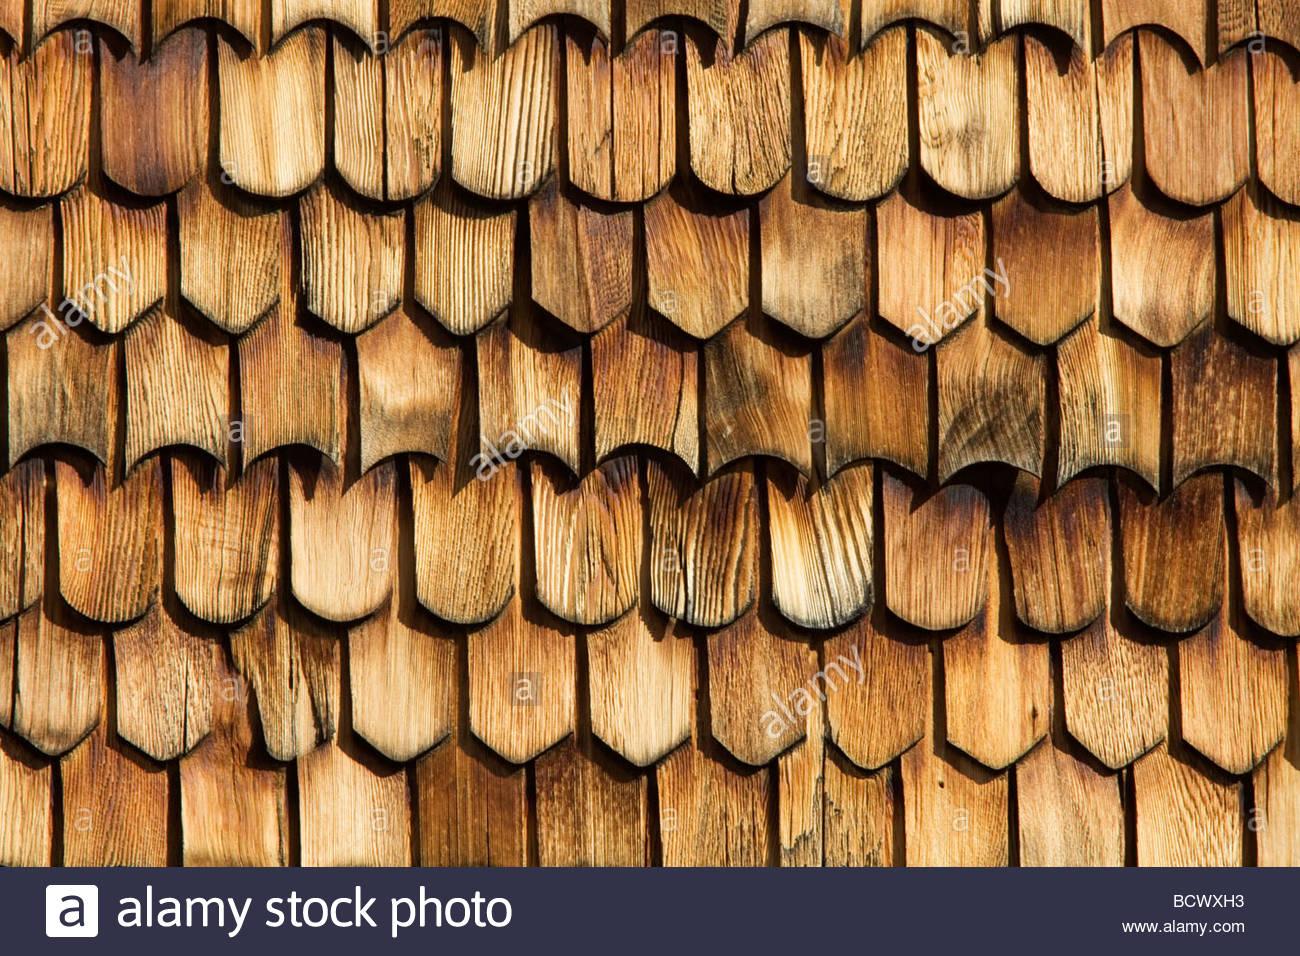 Weathered wood slats siding boards texture - Stock Image